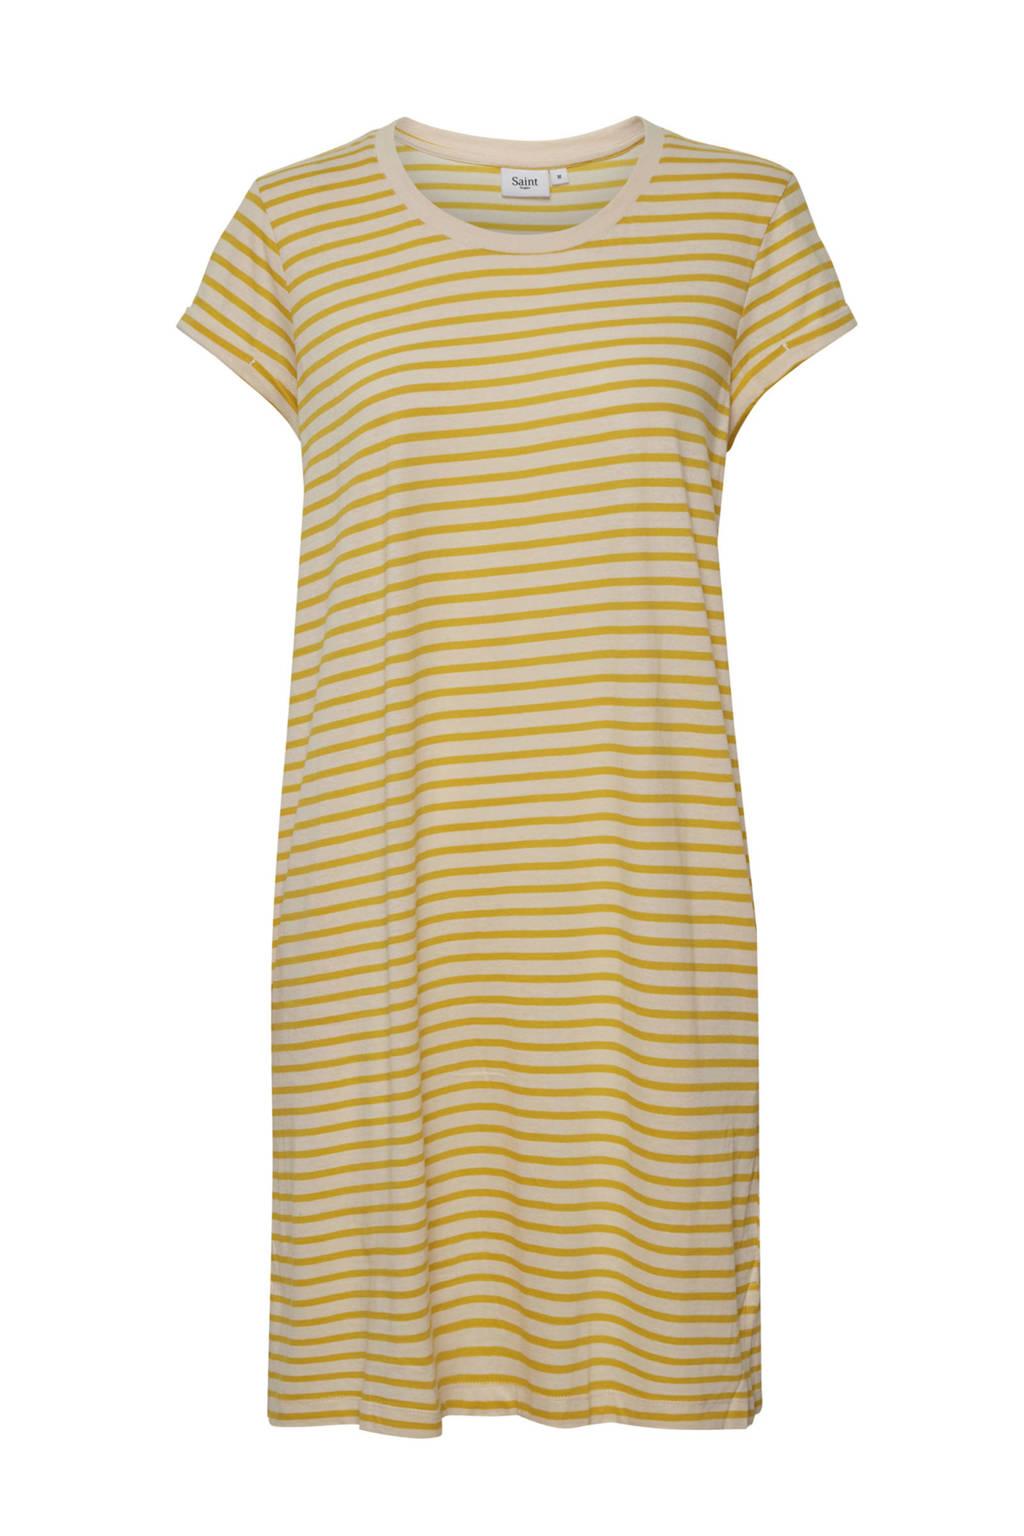 Saint Tropez gestreepte jersey jurk Flora ecru, Ecru